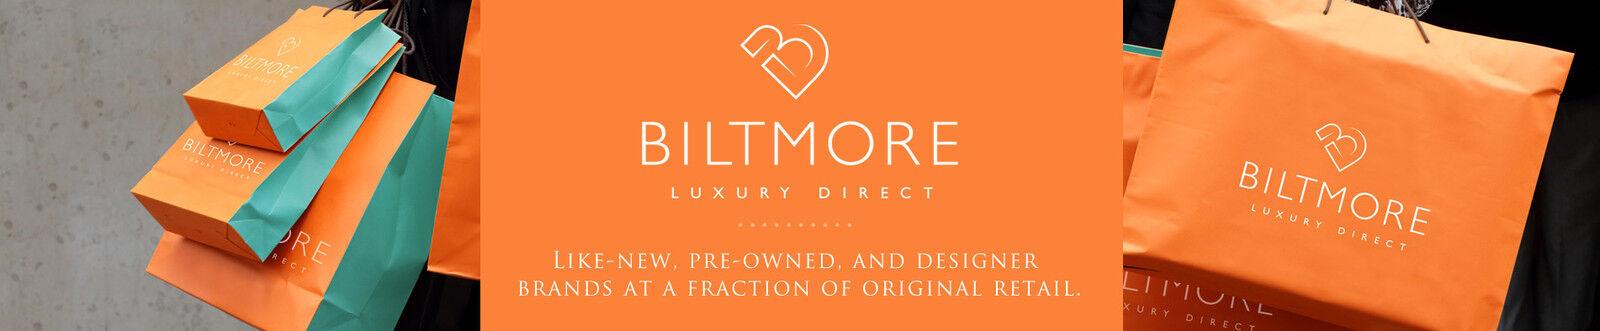 Biltmore Luxury Direct